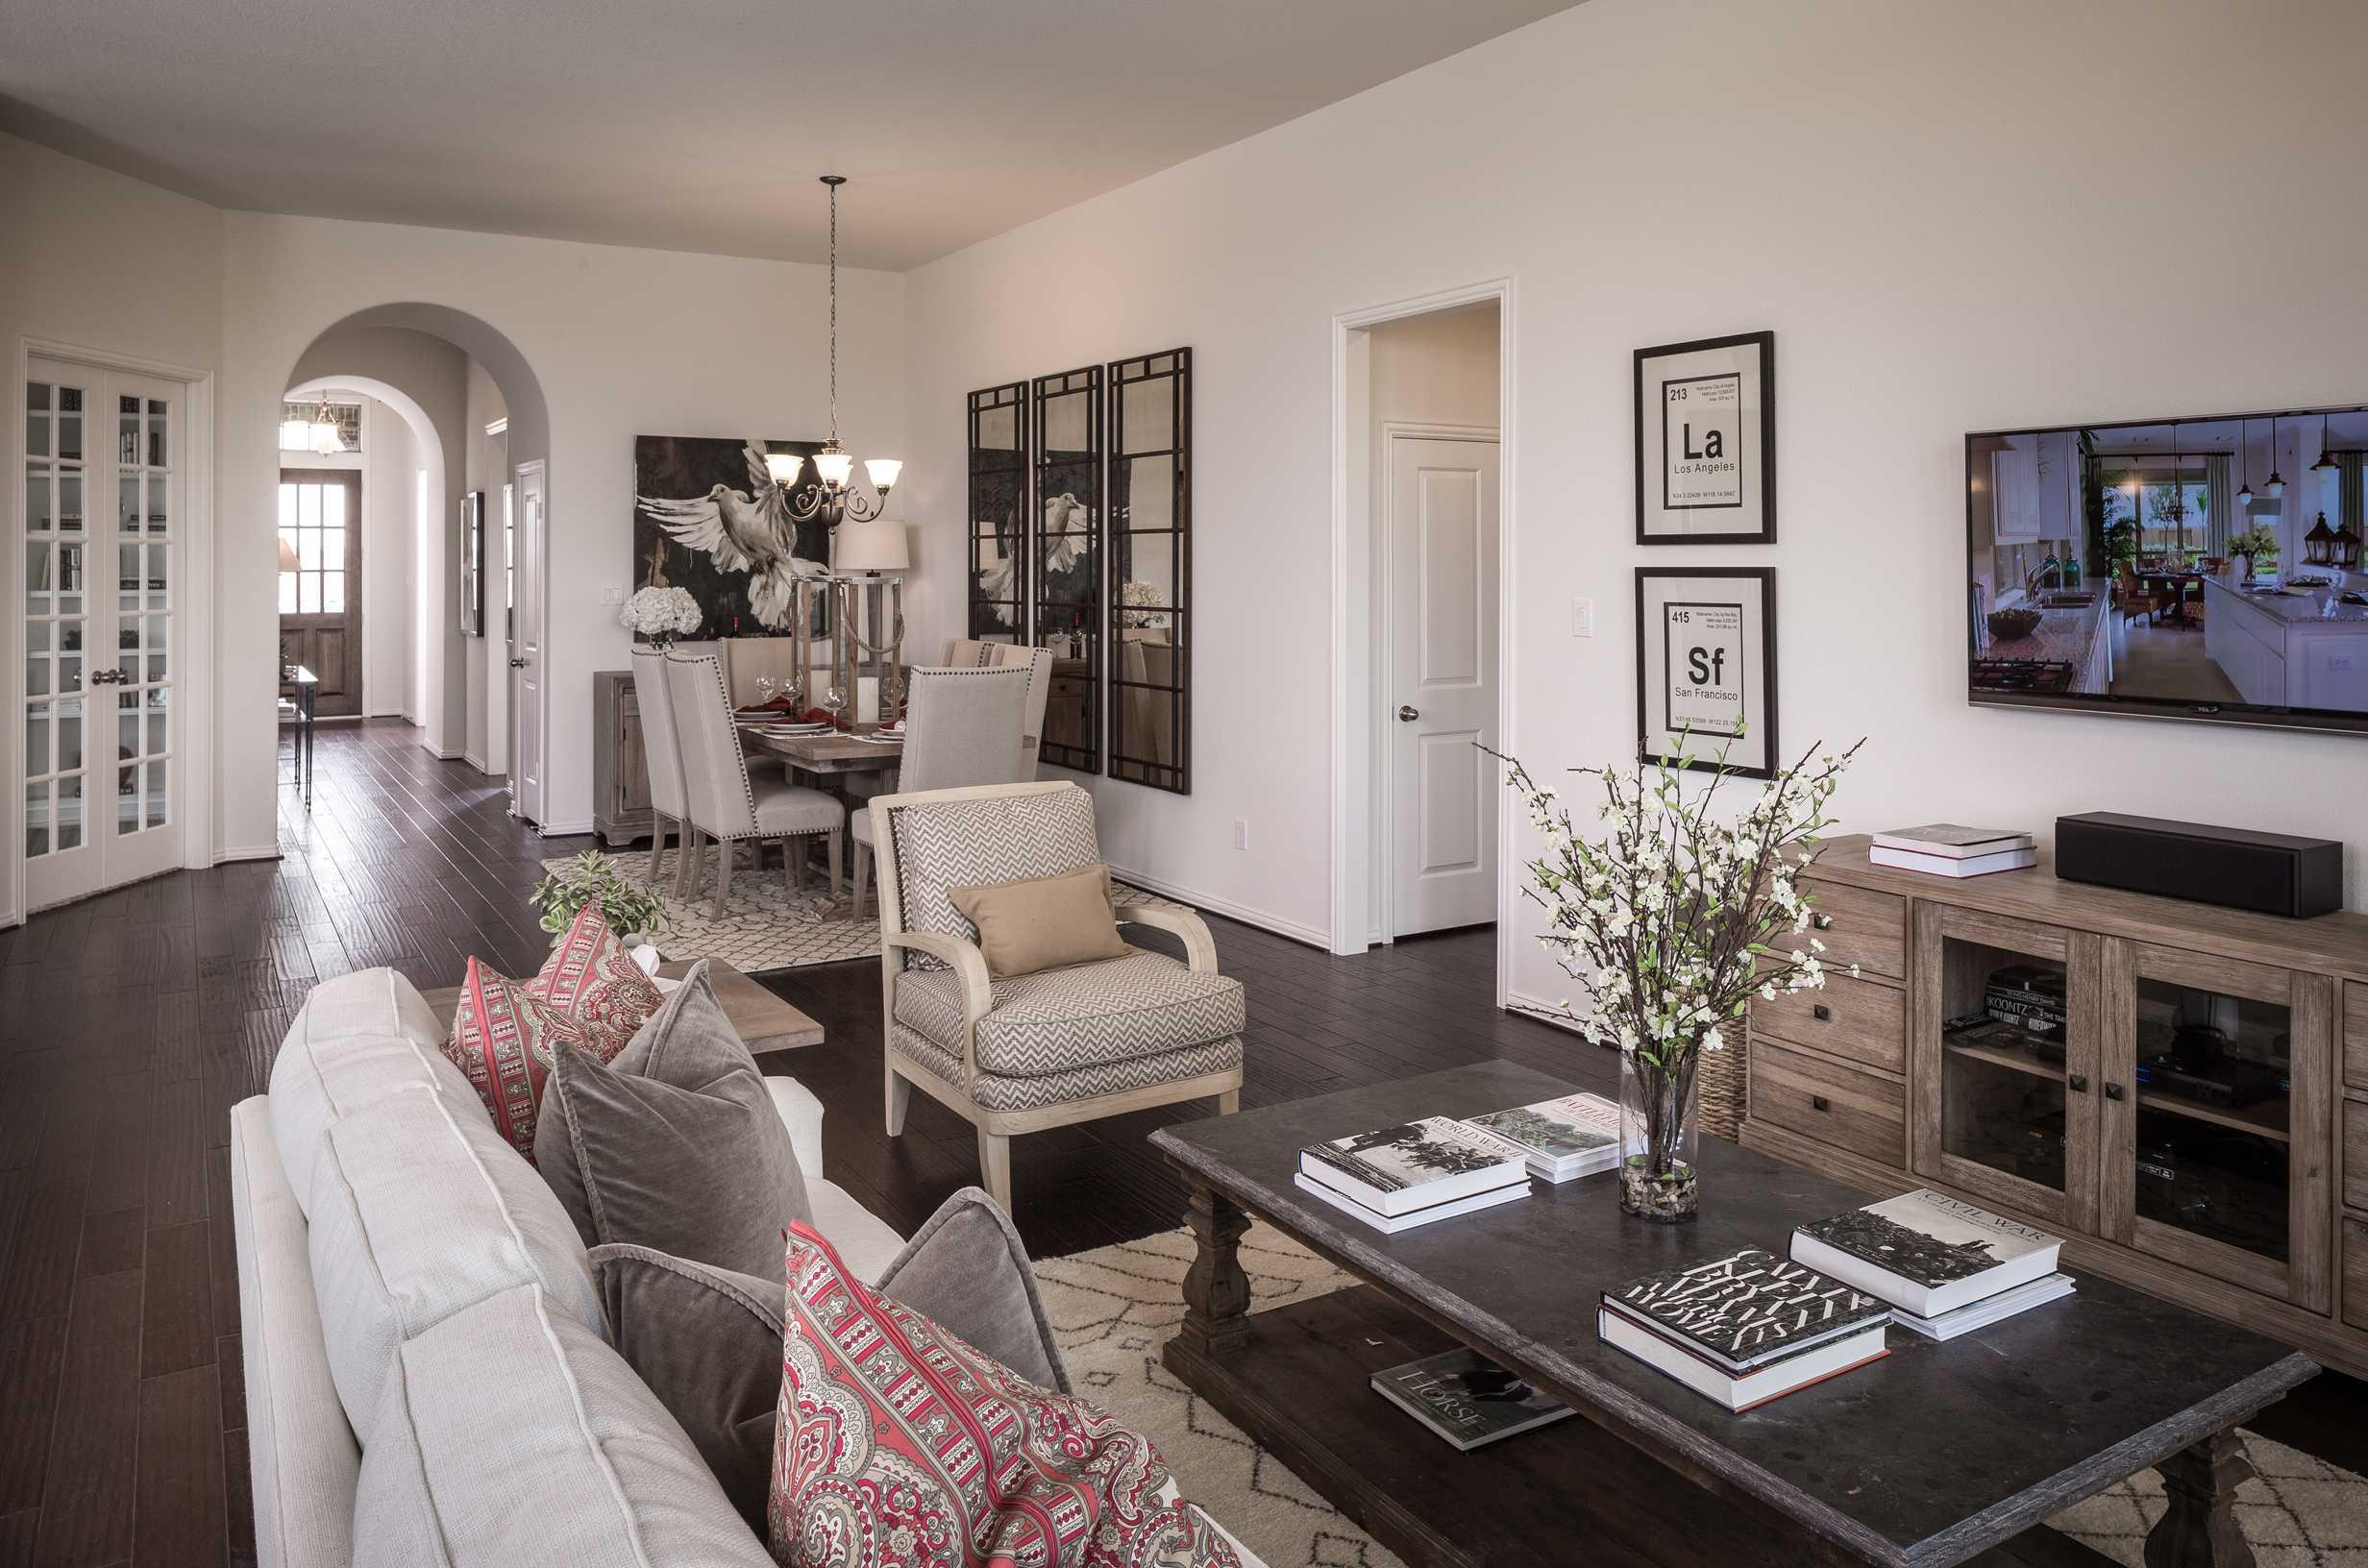 Model Home In Houston Texas Grand Mission Estates 50s Community